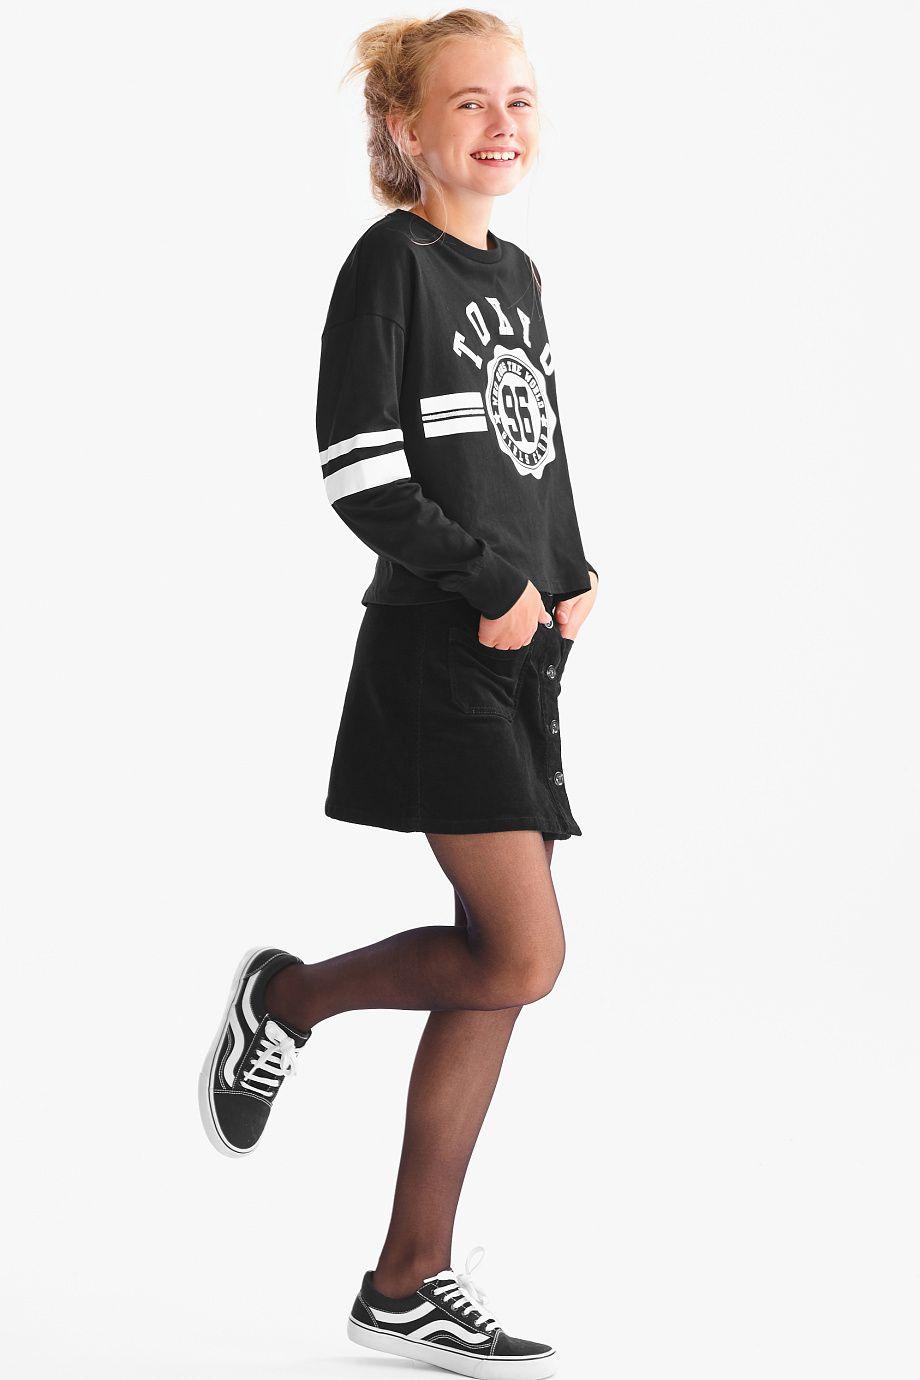 rock in 2020  mädchen strumpfhose strumpfhosen outfit